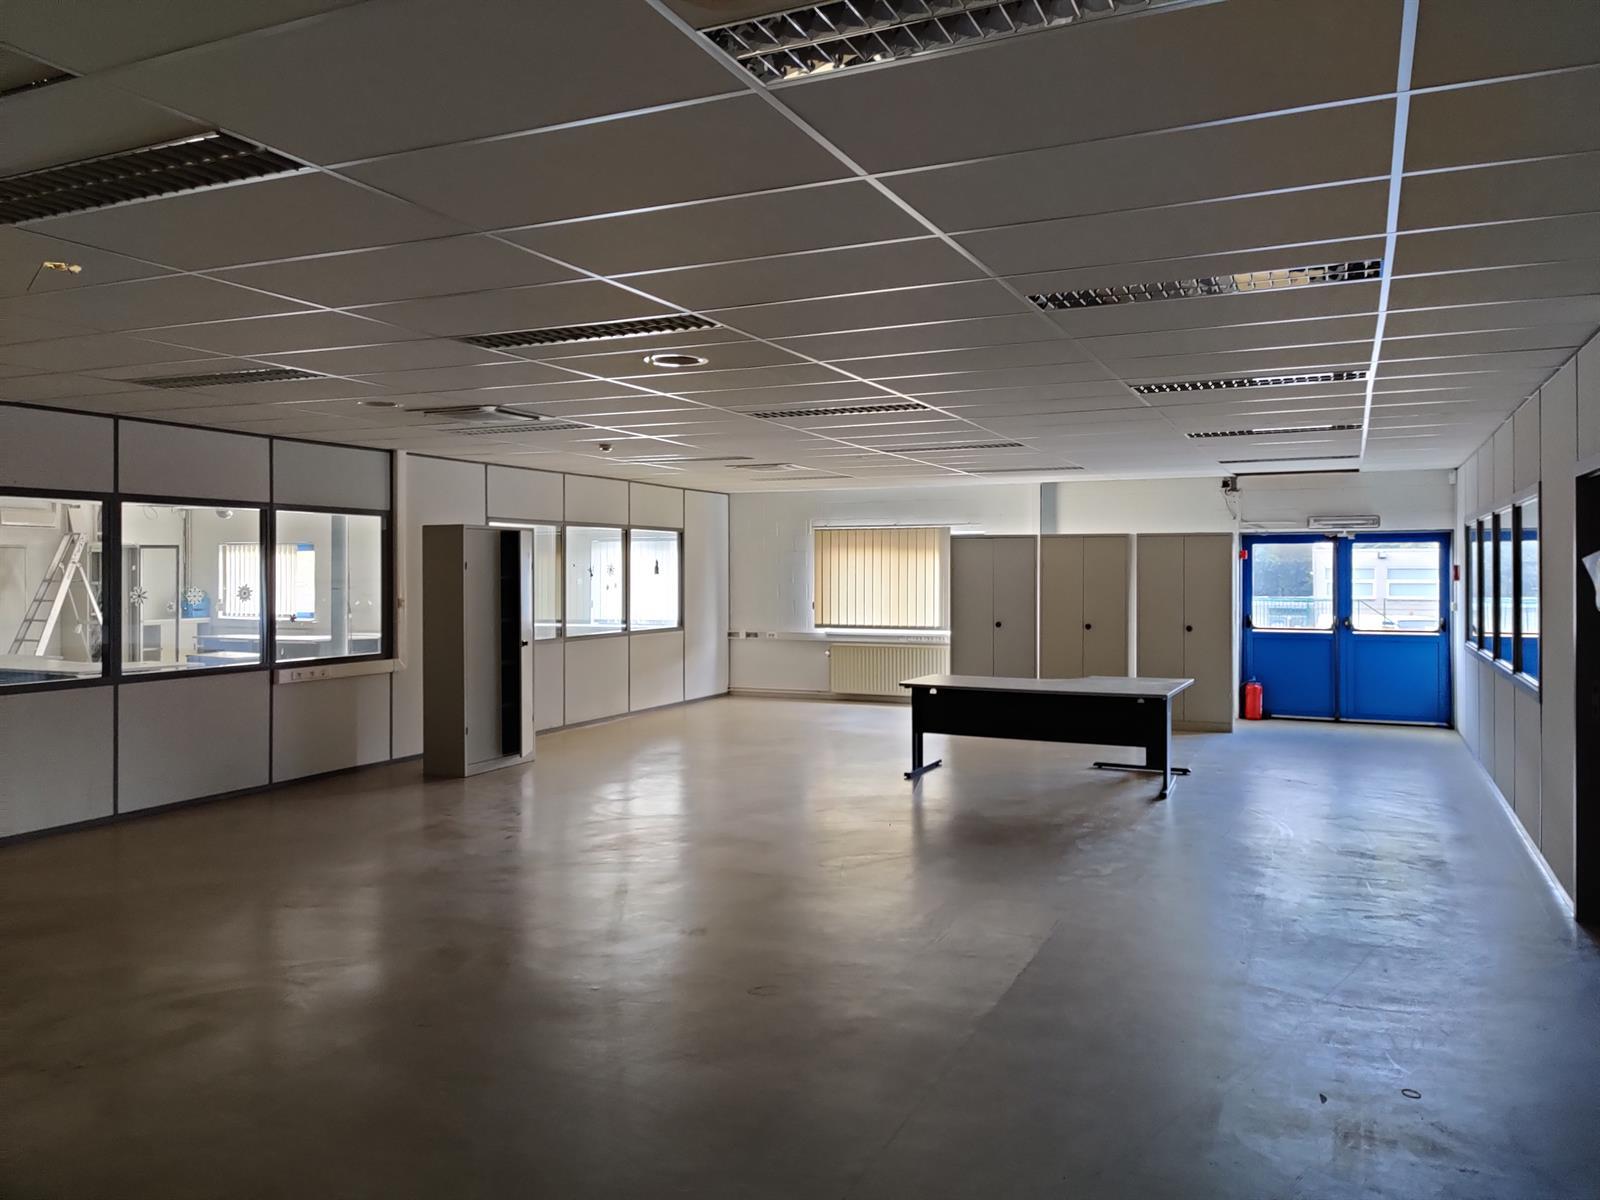 gebouw voor gemengd gebruik te huur I173 - Quatrieme Rue , 6040 Charleroi Jumet, België 30